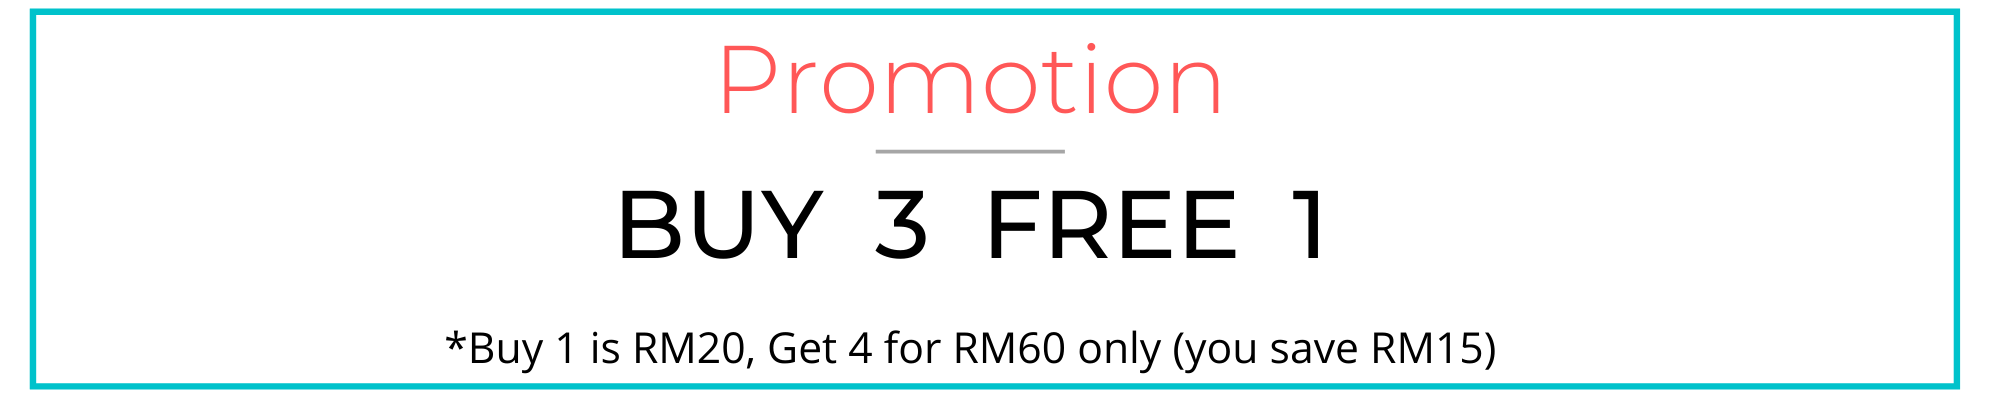 Buy 3 free 1 offer Metime Art